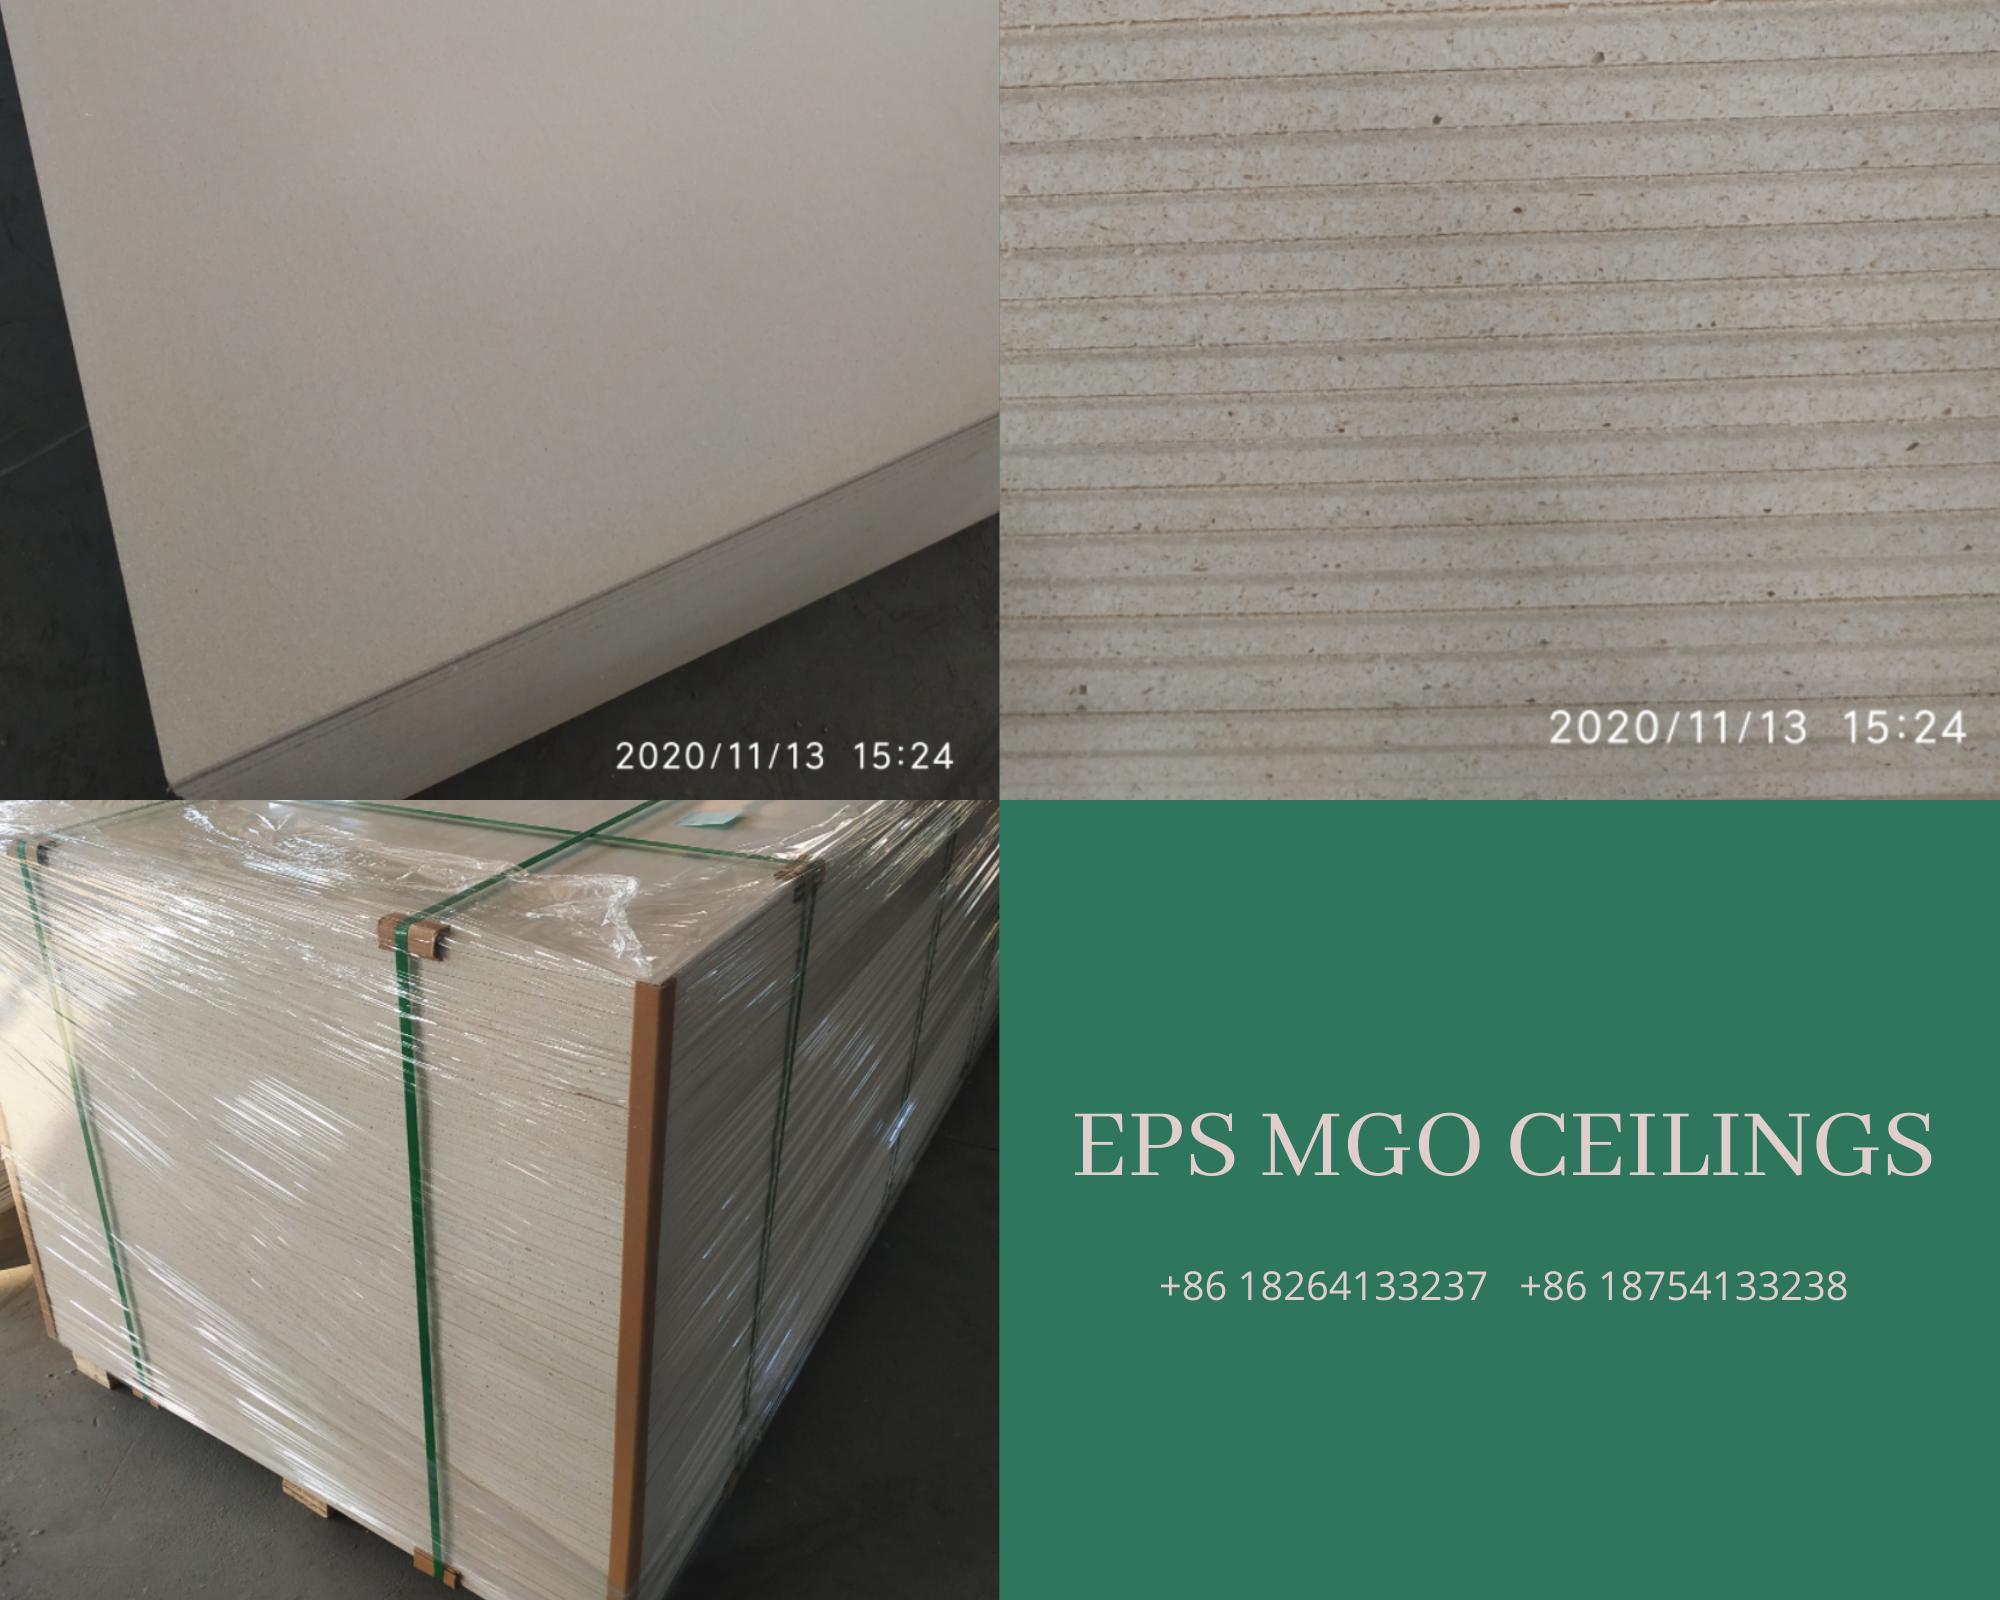 EPS mgo ceilings